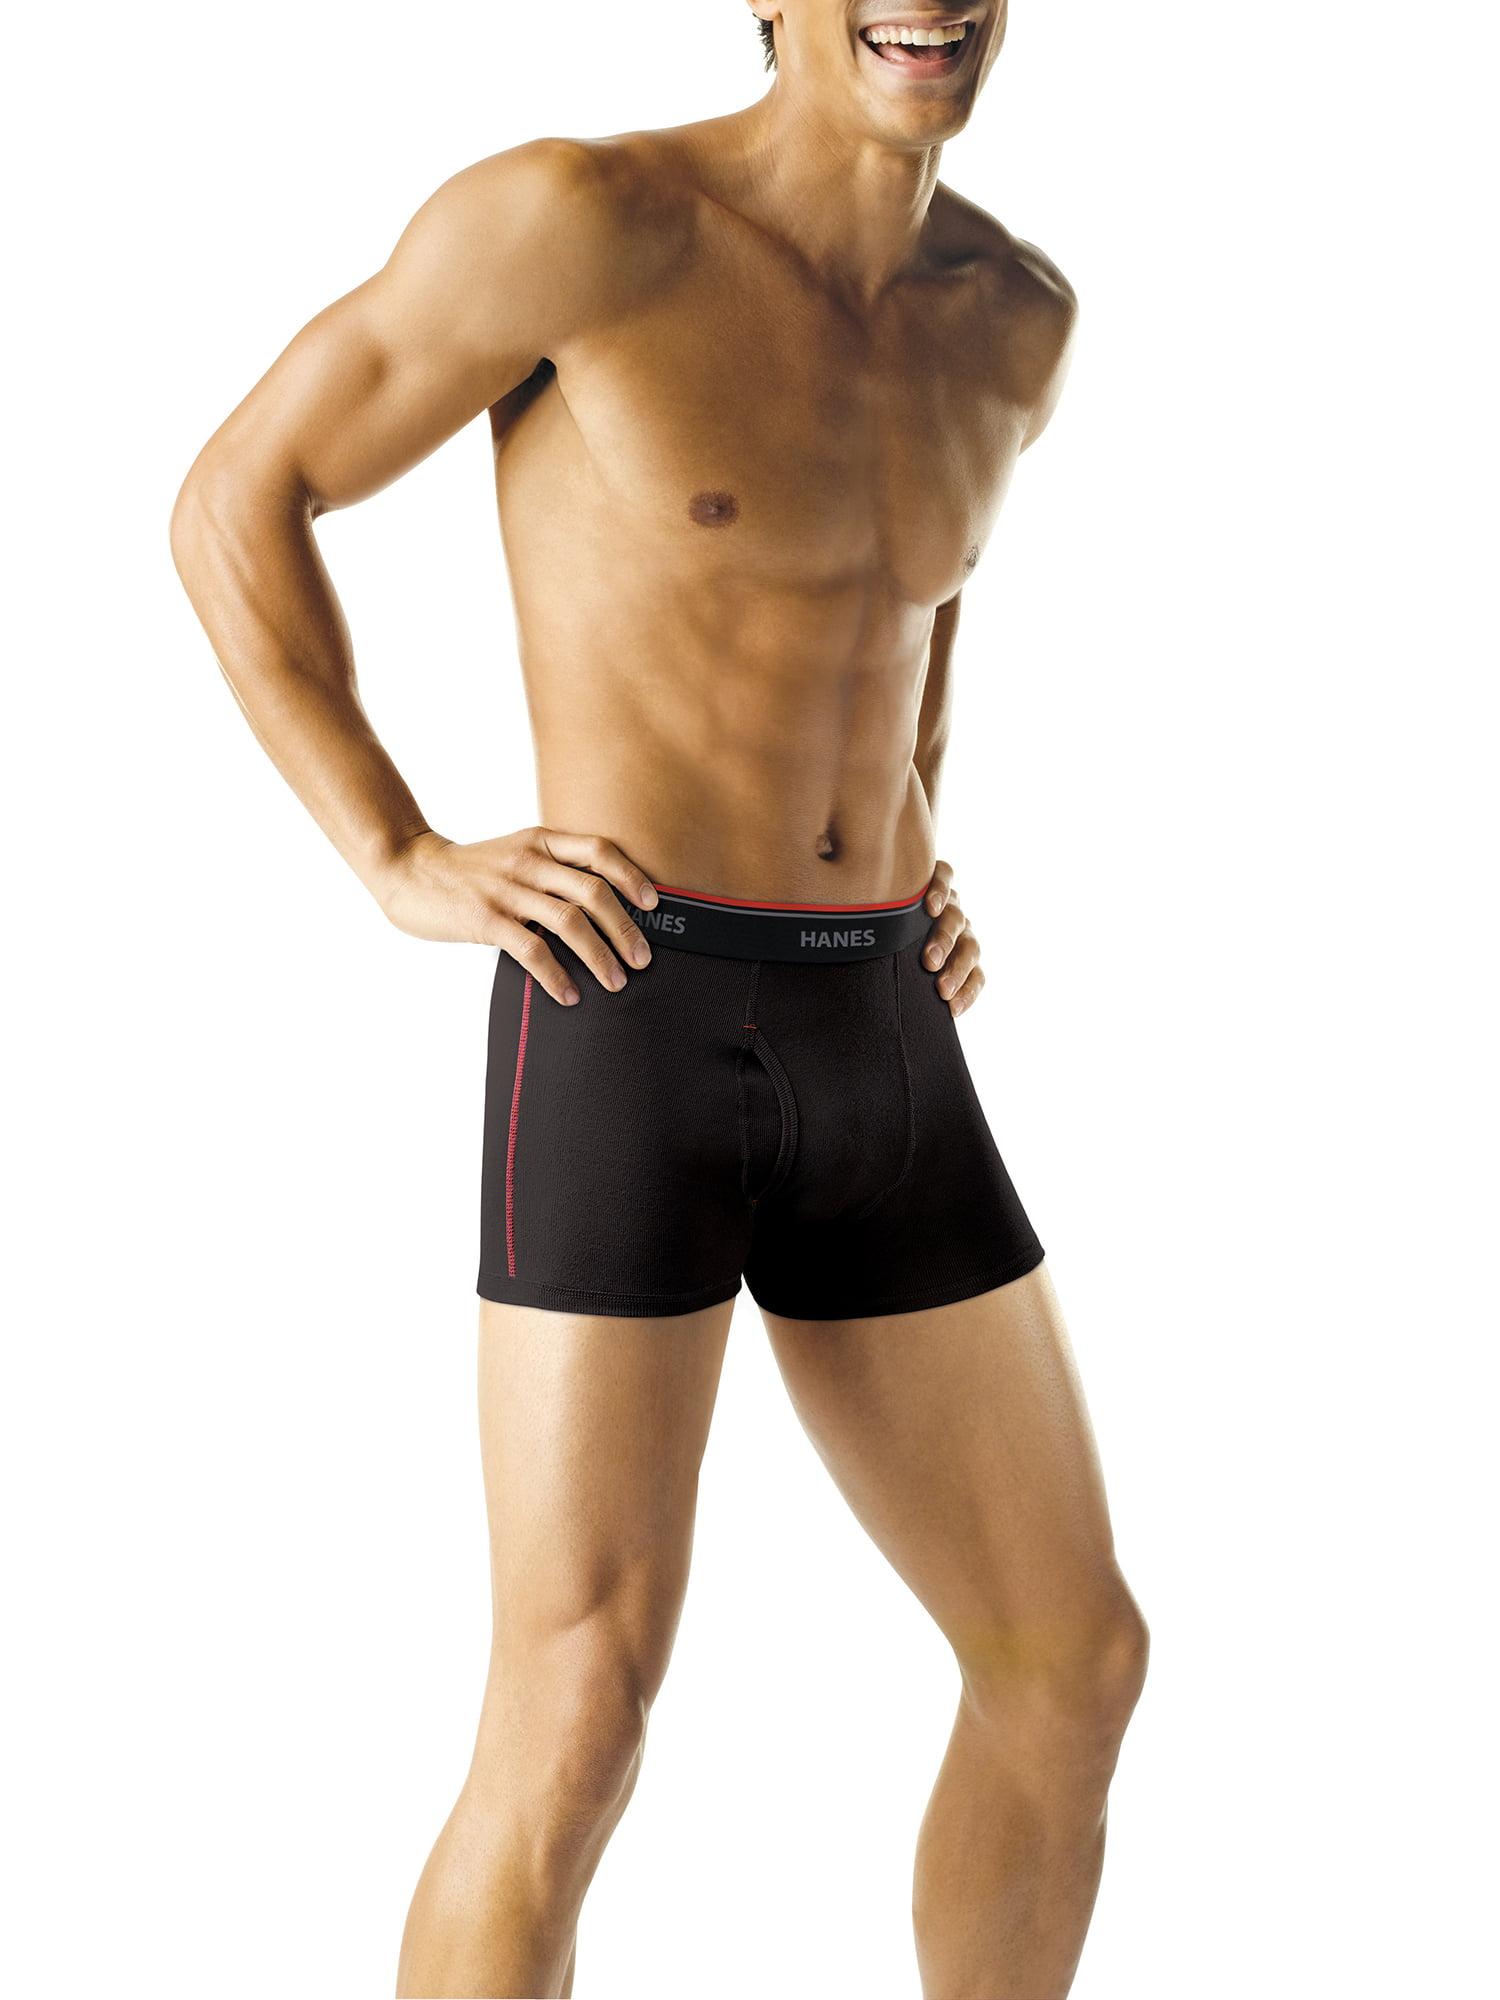 Cotton Comfortable Underwear for Mens Mens Fear No Fish Boxer Brief